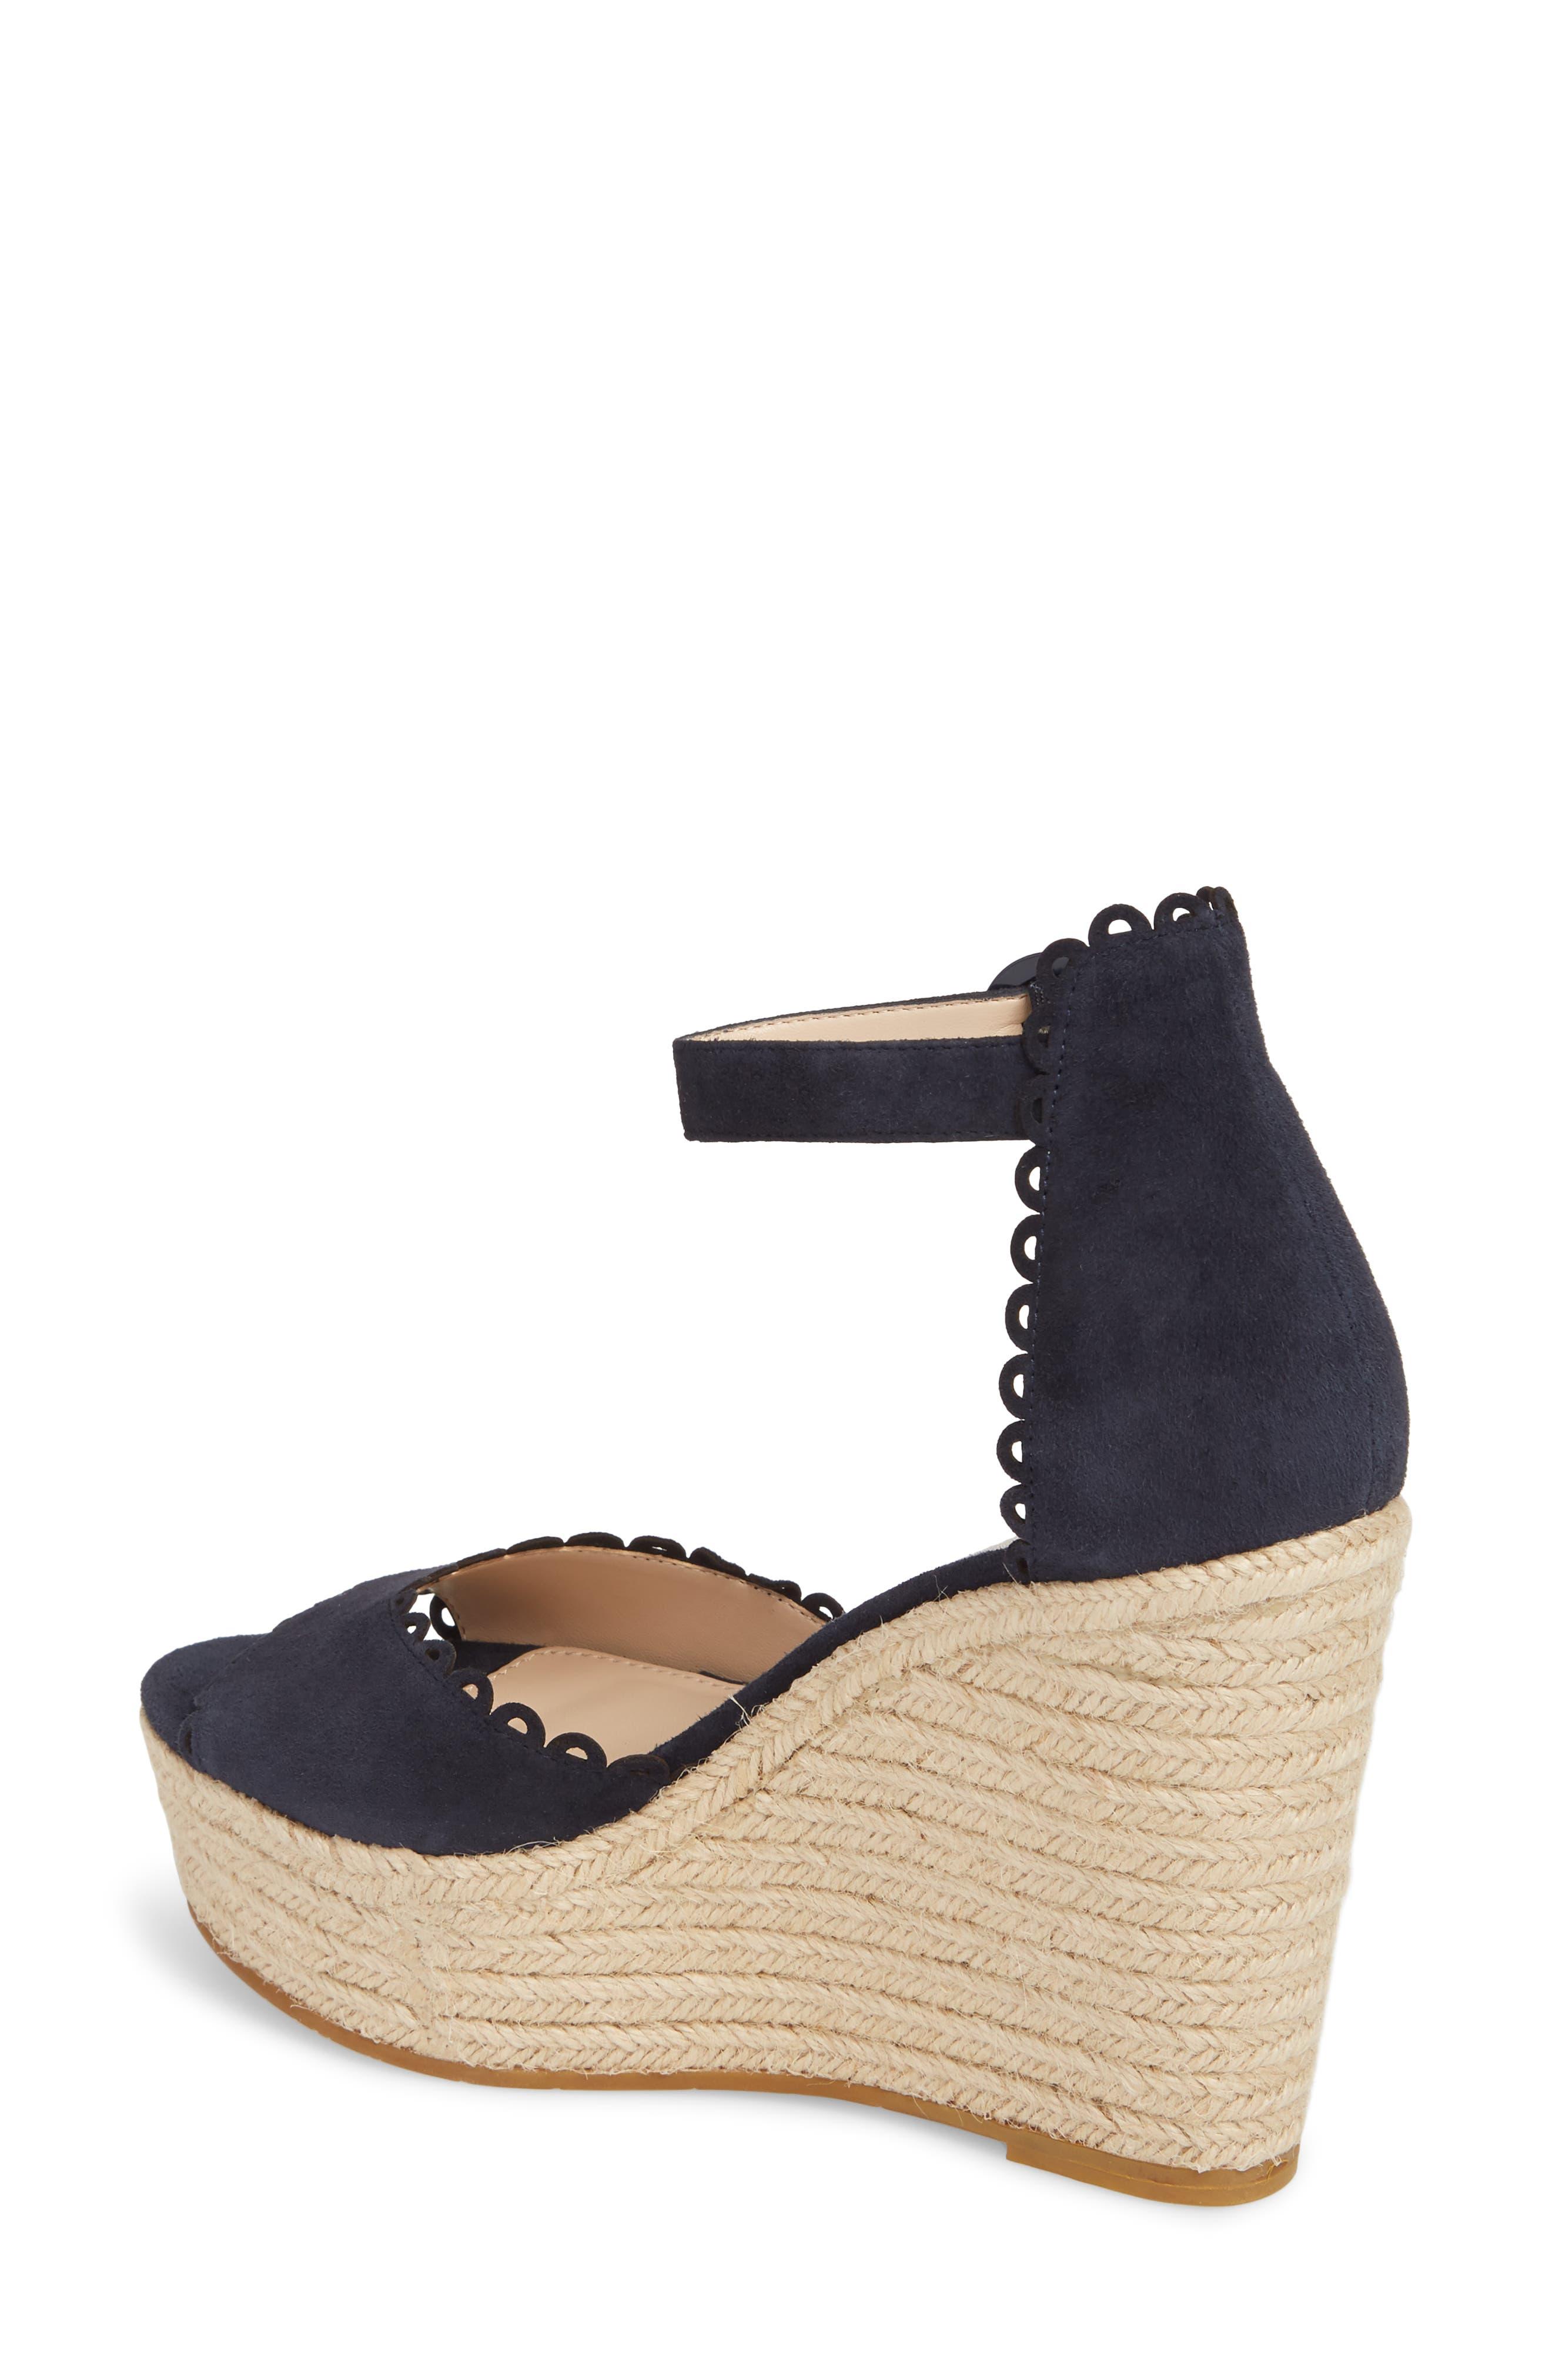 Alternate Image 2  - Pelle Moda Raine Platform Espadrille Sandal (Women)